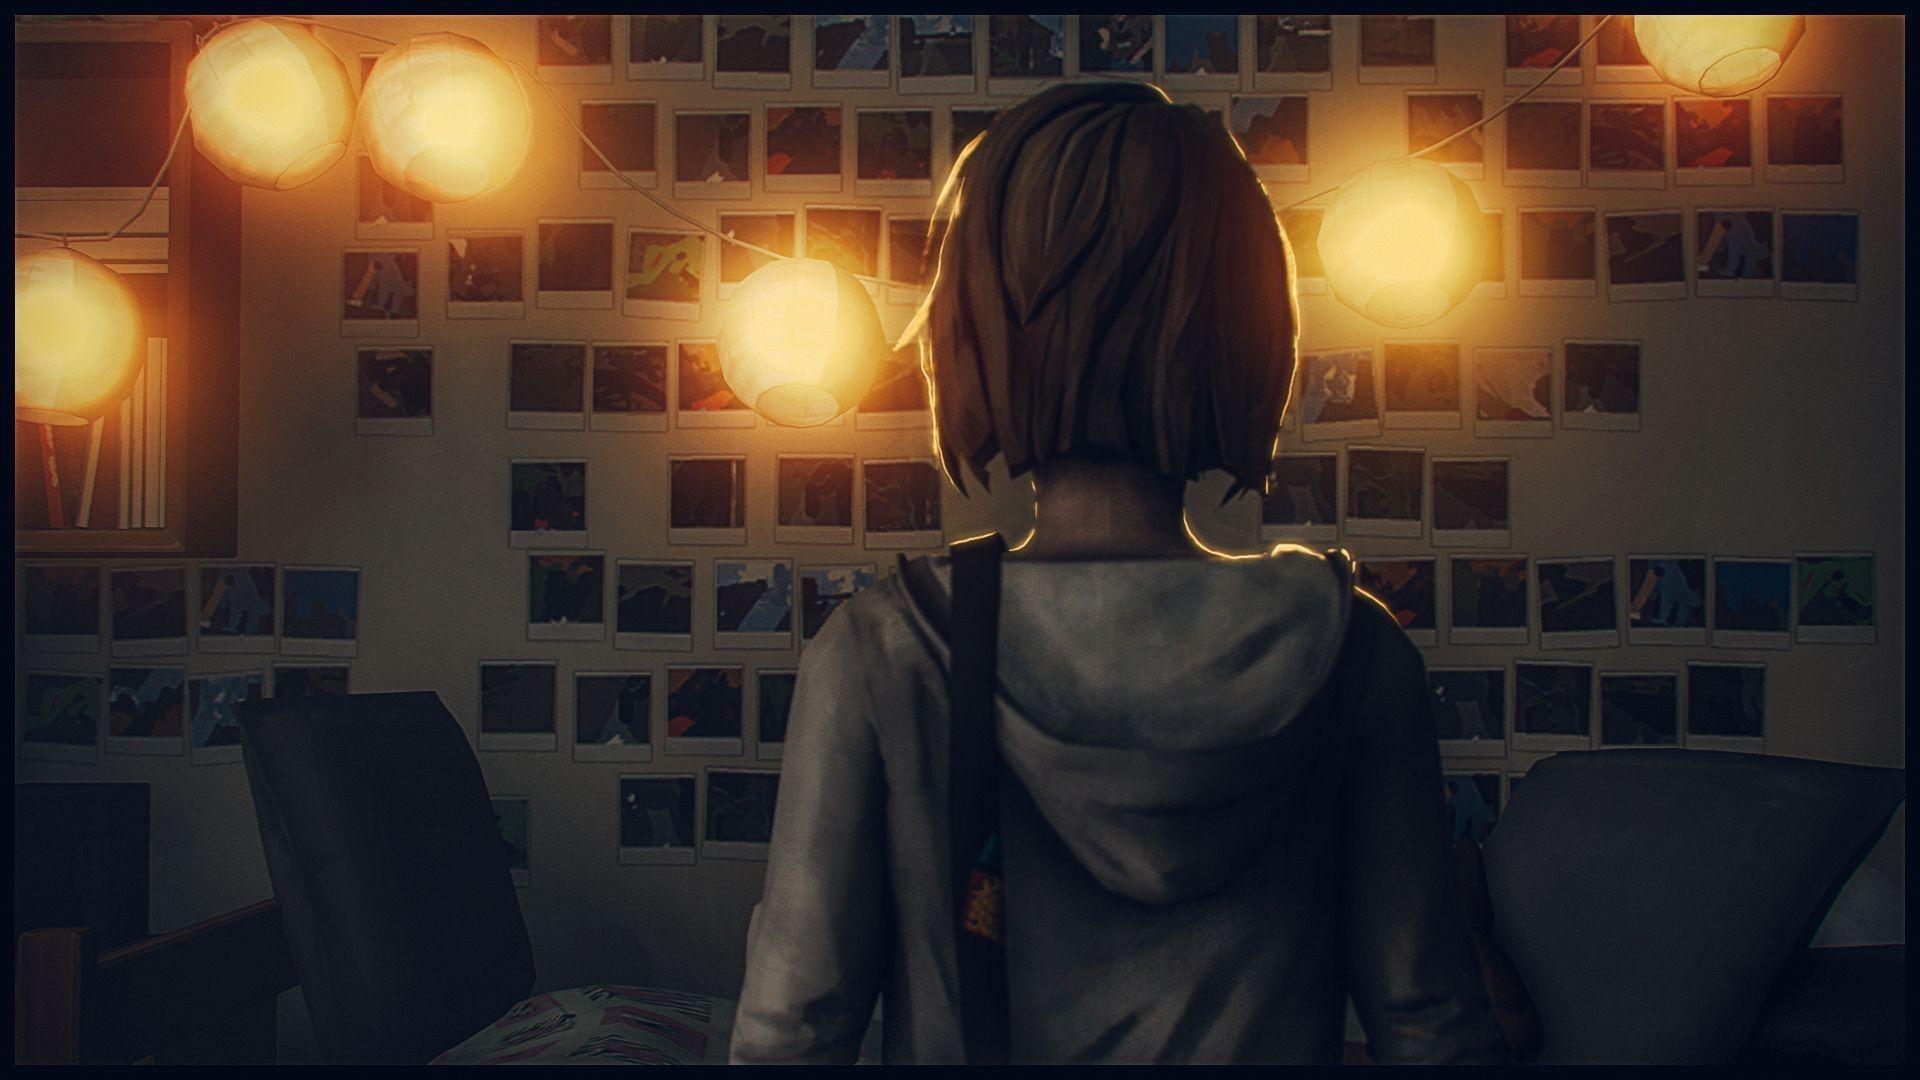 Life Is Strange hd wallpaper download